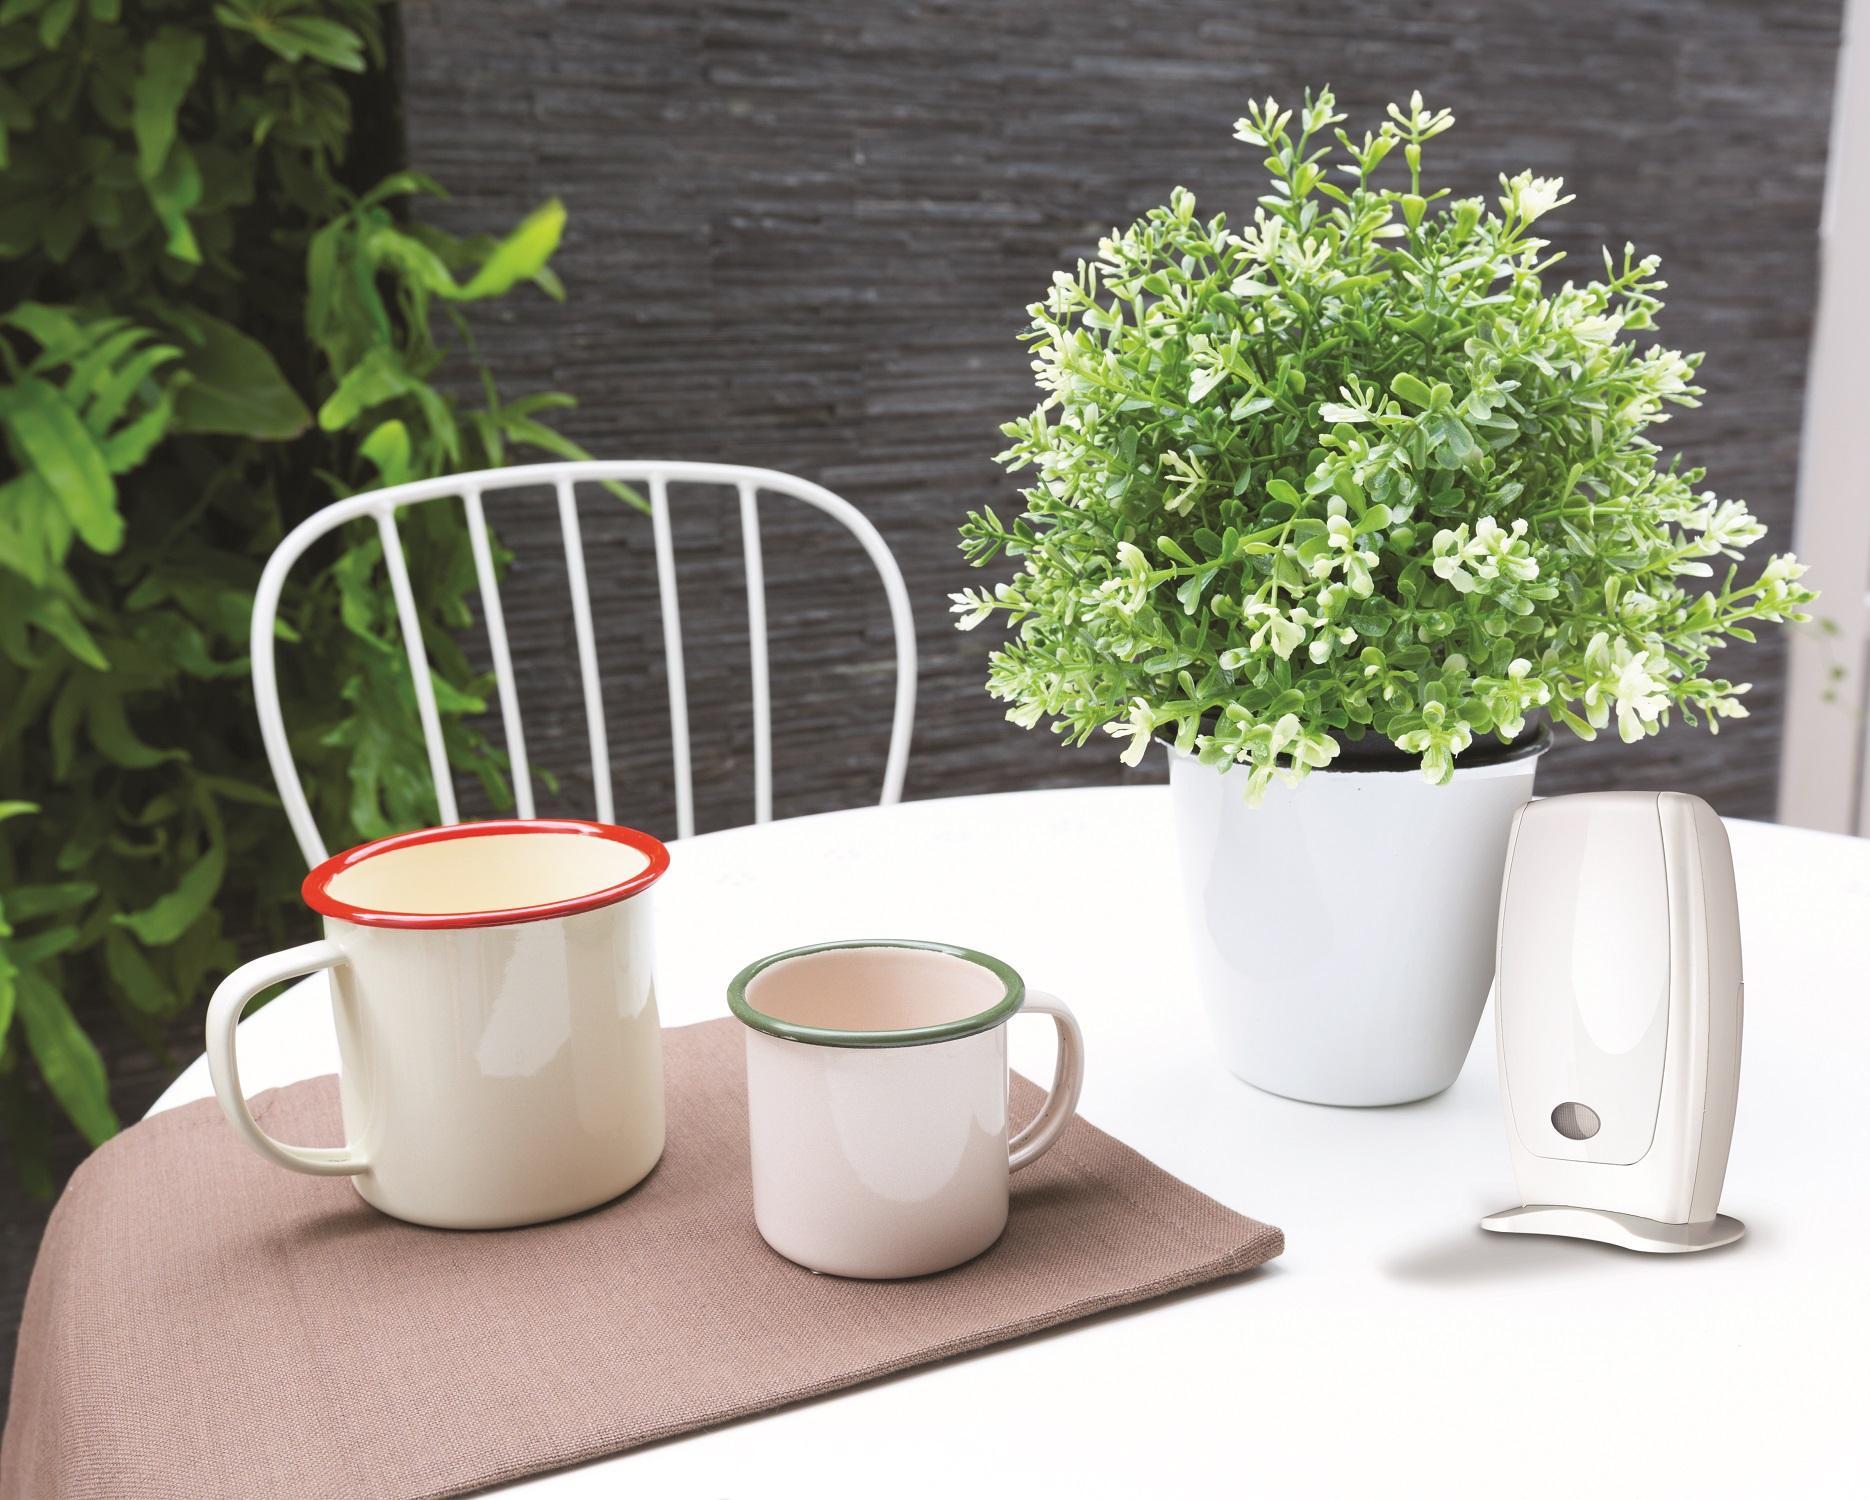 trust smart home 433 mhz tragbare funk t rklingel amazon. Black Bedroom Furniture Sets. Home Design Ideas